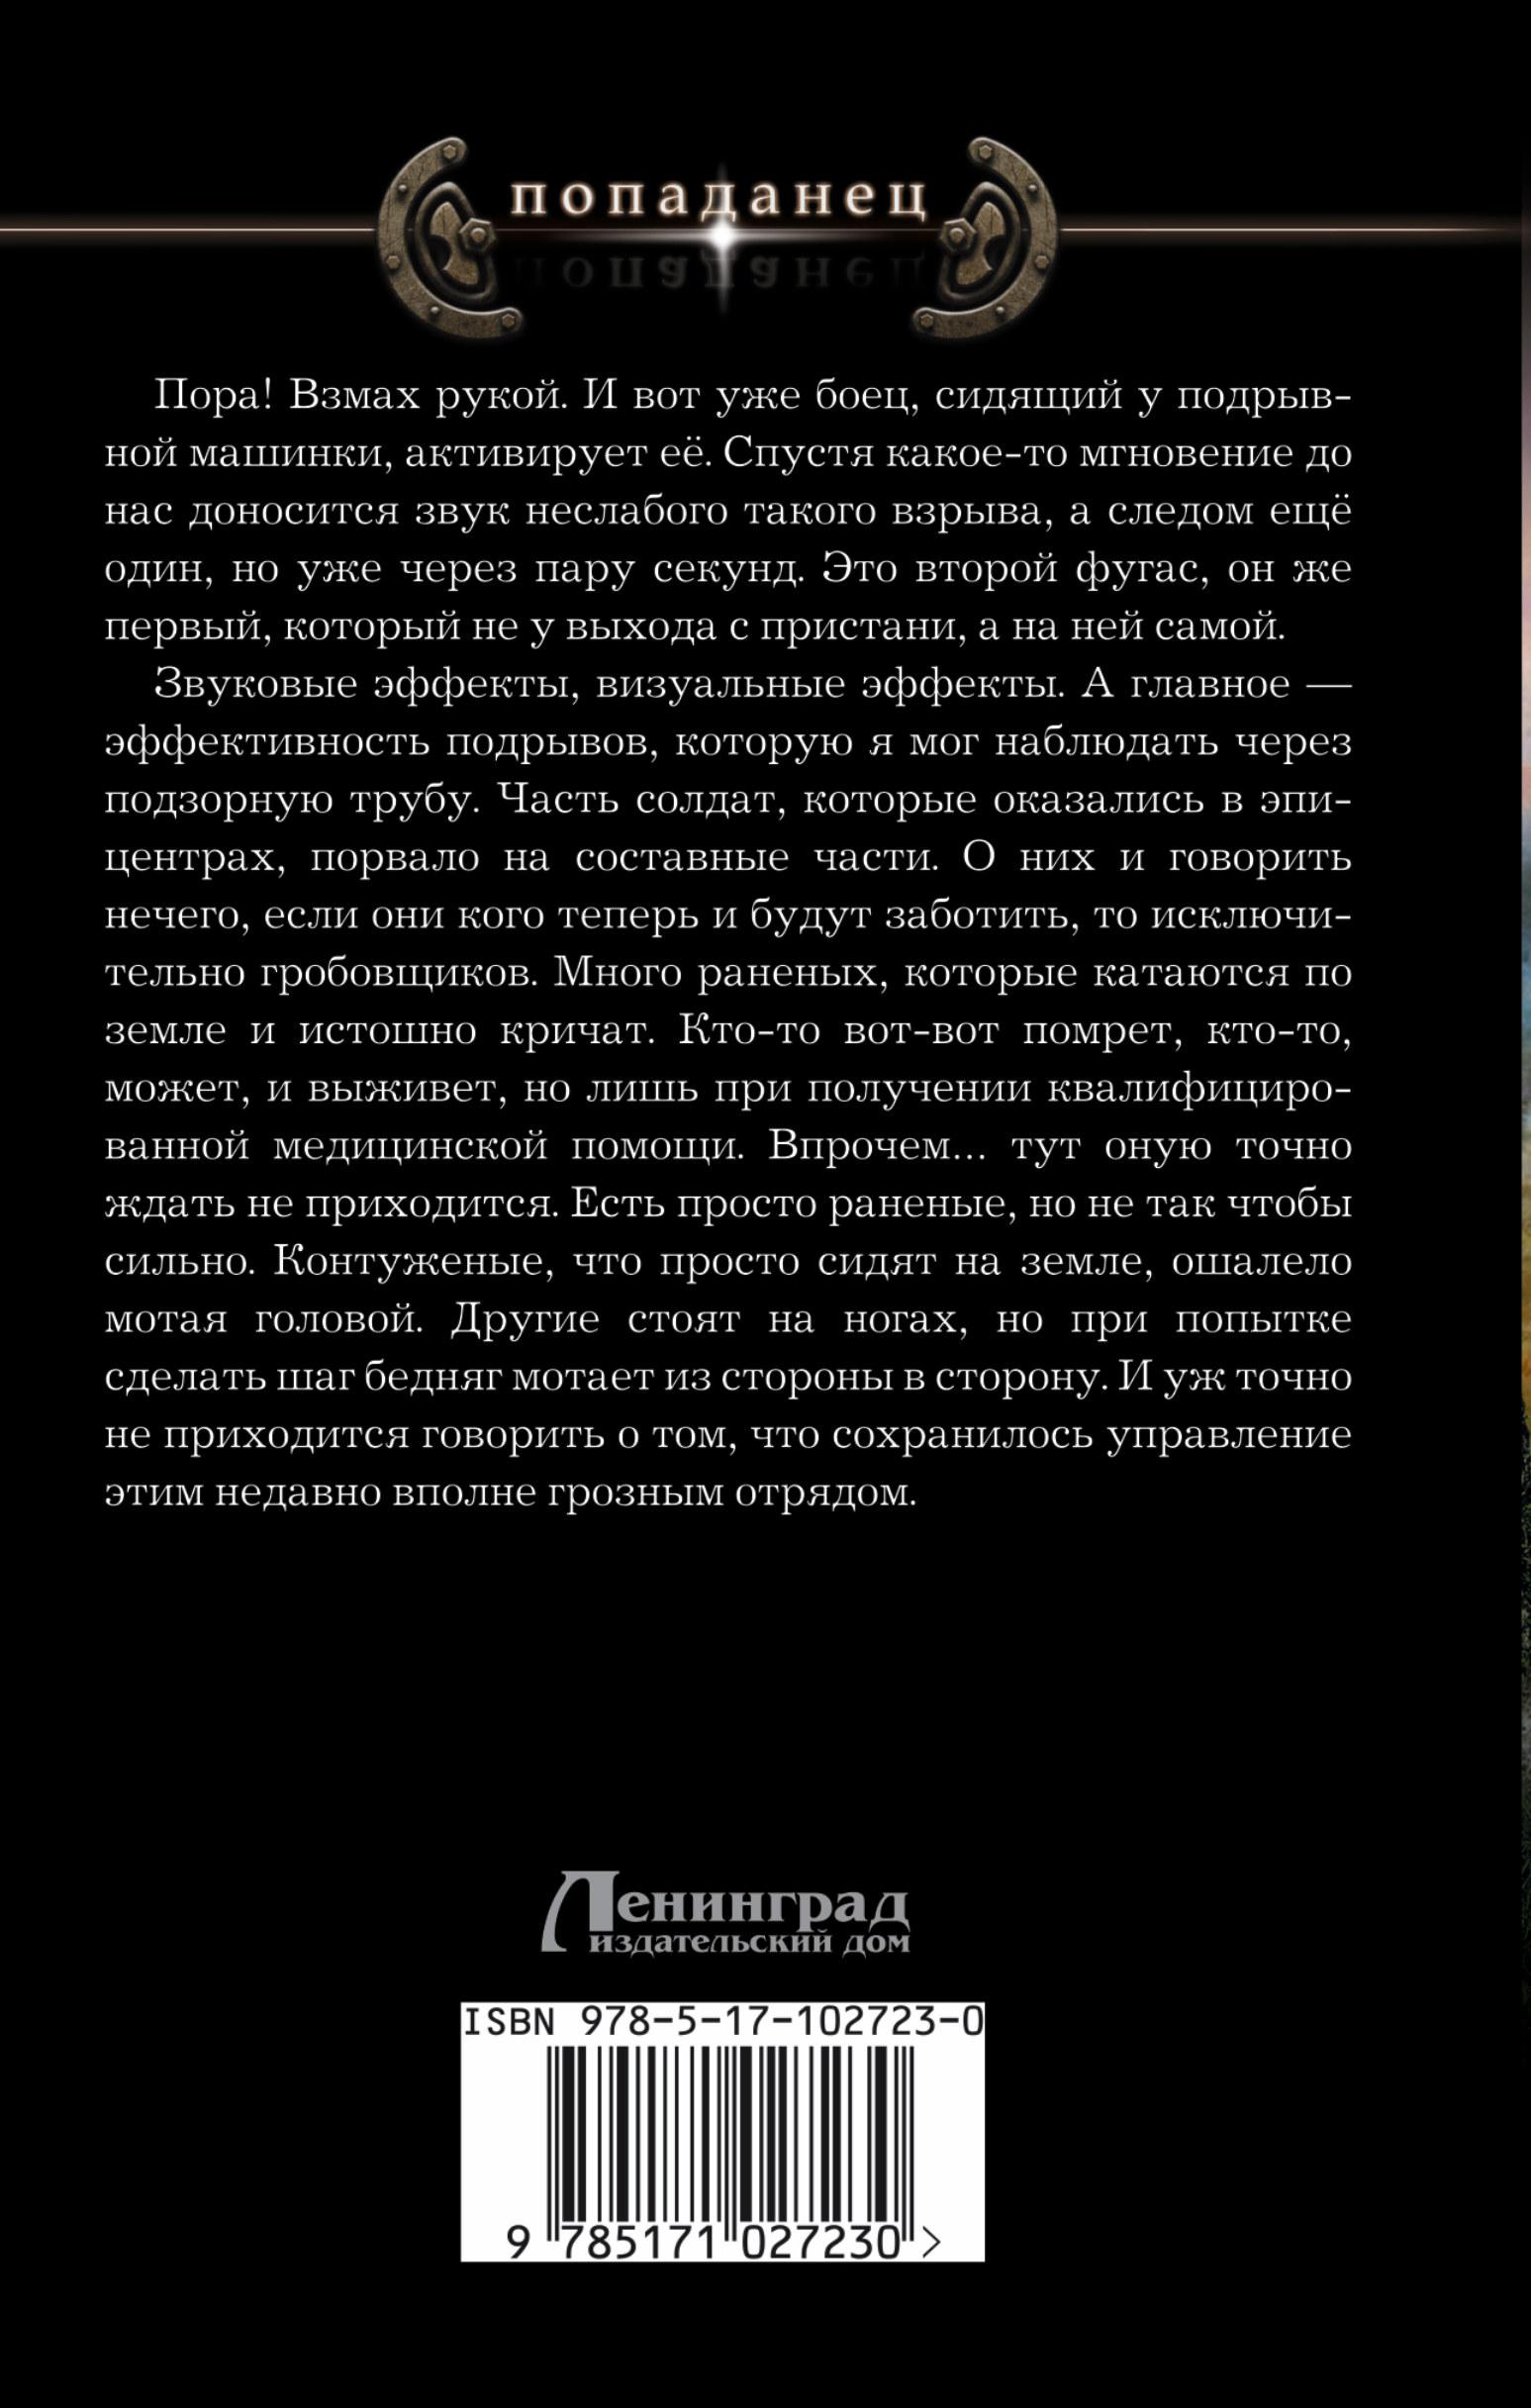 Конфедерат. Влад Поляков